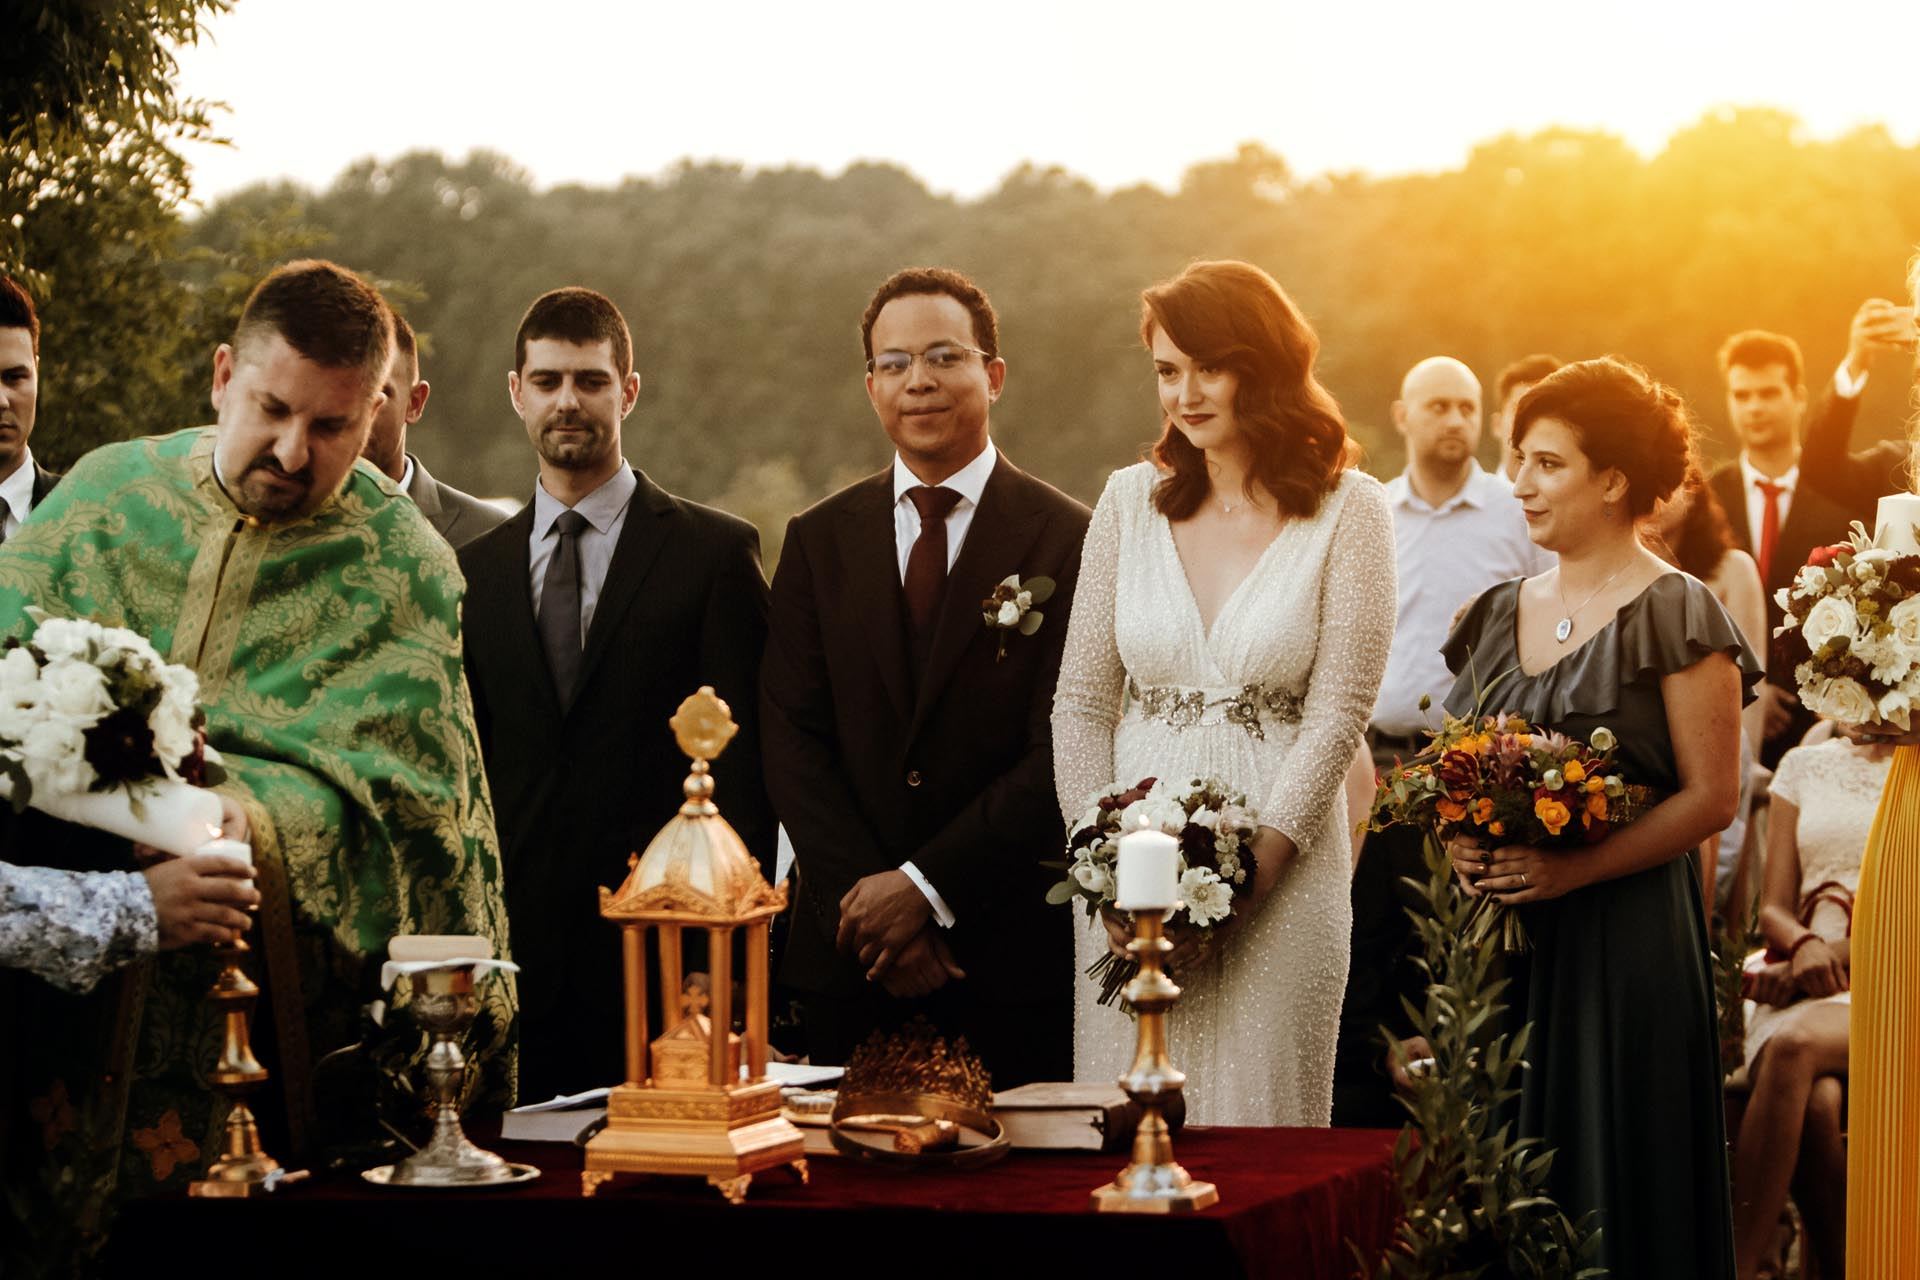 Fotografii Nunta Iulia 1 Teoria Zambetului